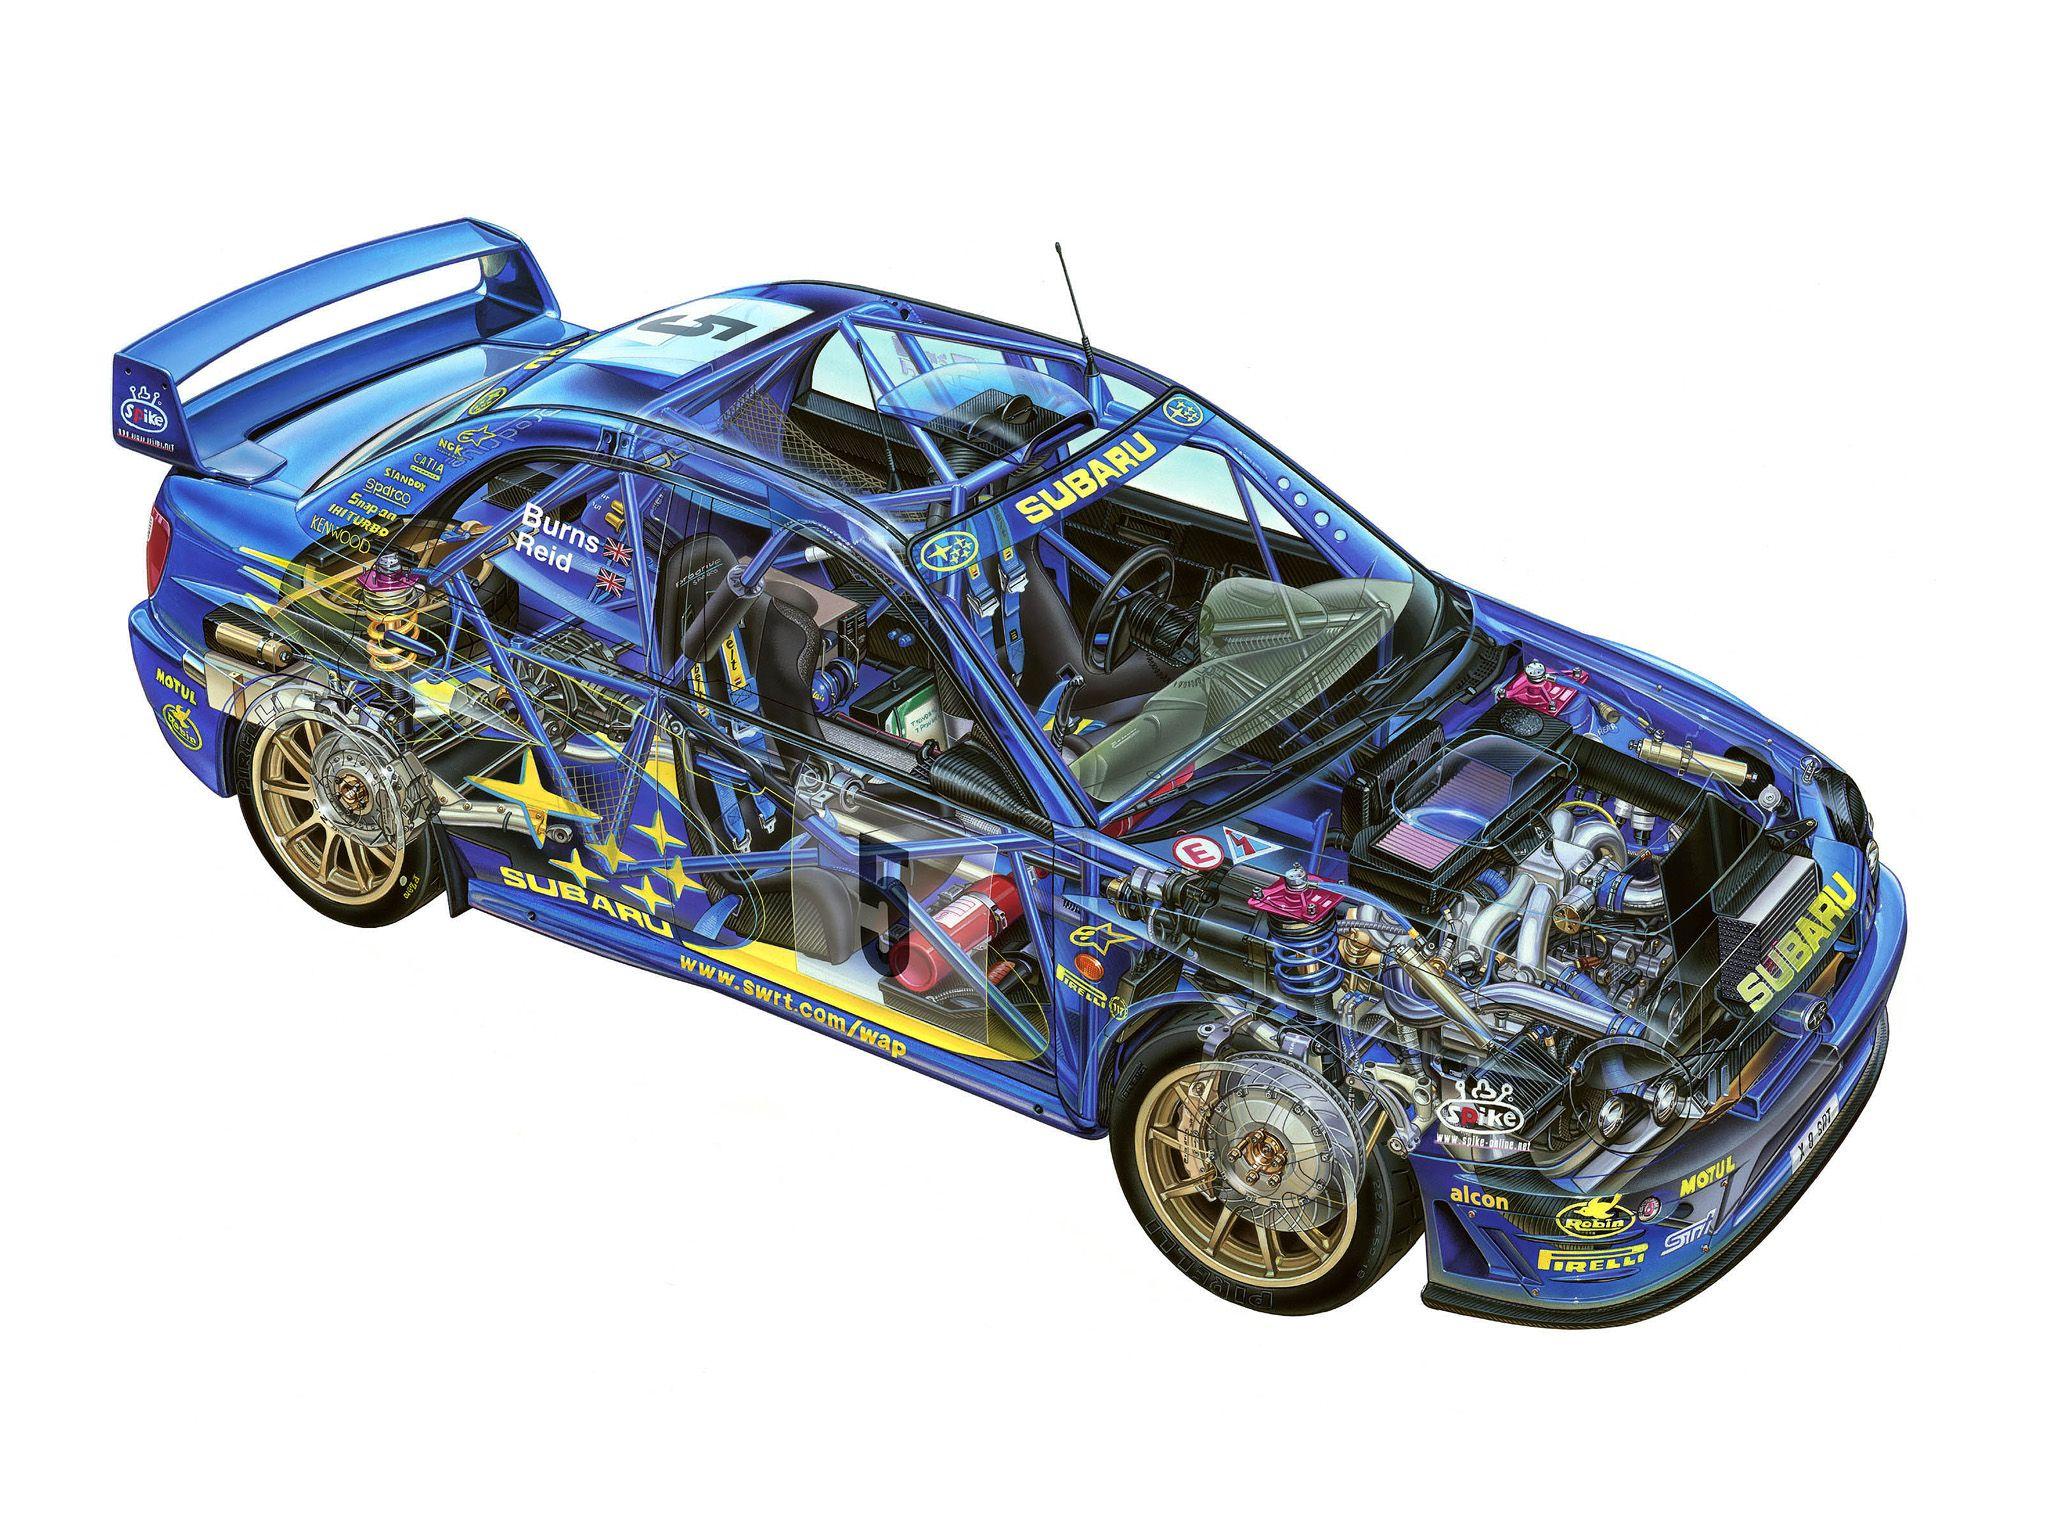 Subaru Impreza WRC (GD) '200102. An awesome illustration